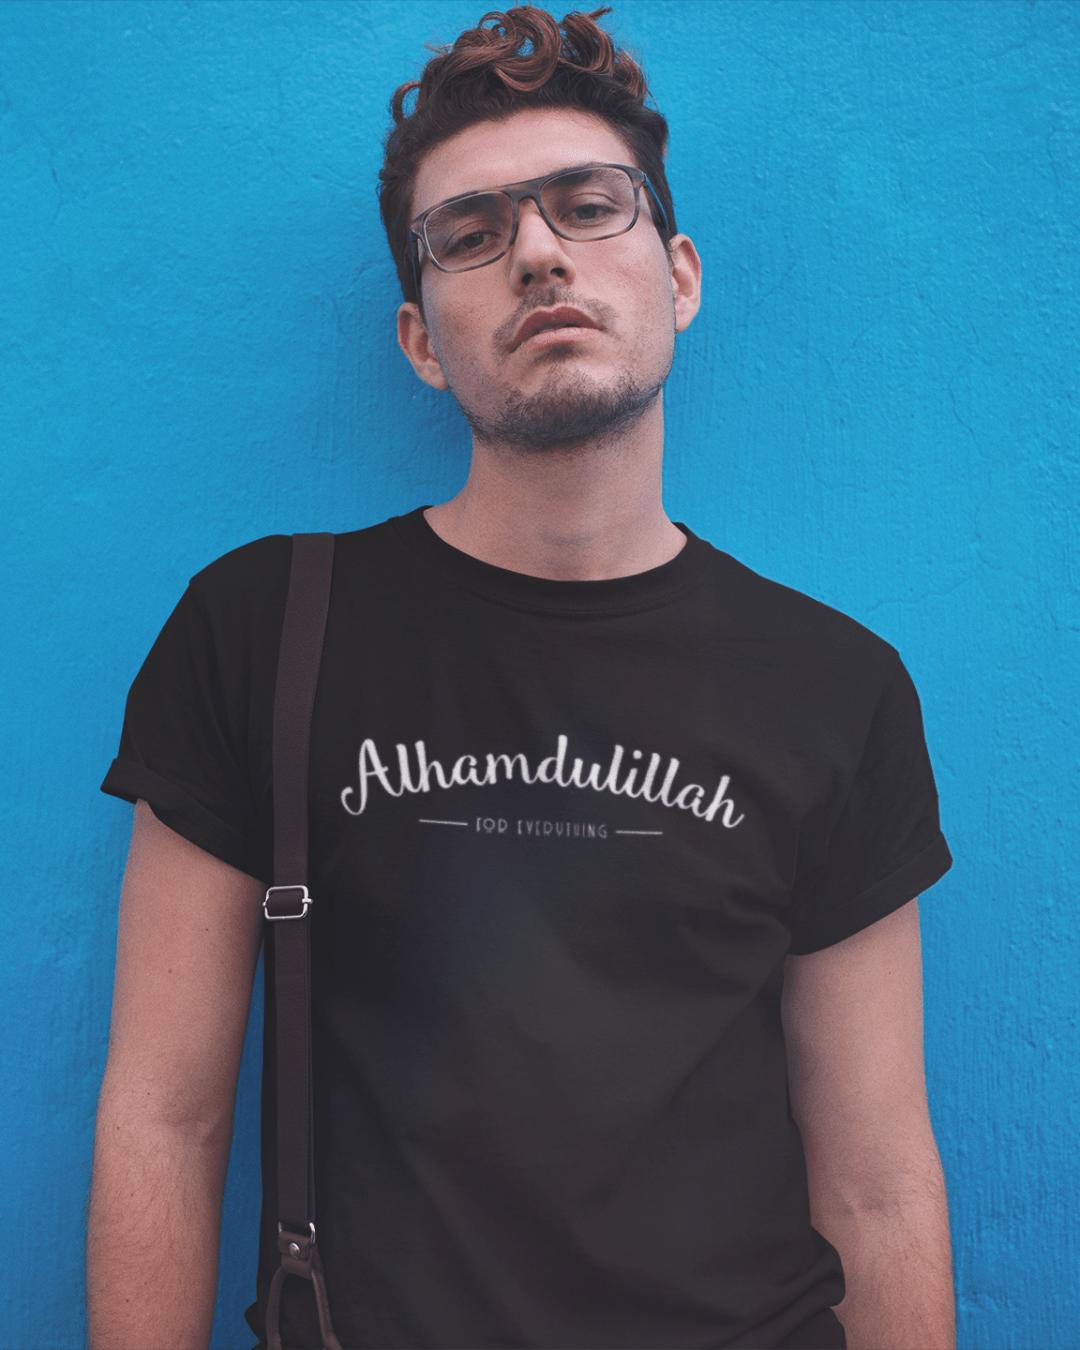 alhamdulliah-short-sleeve-black-1